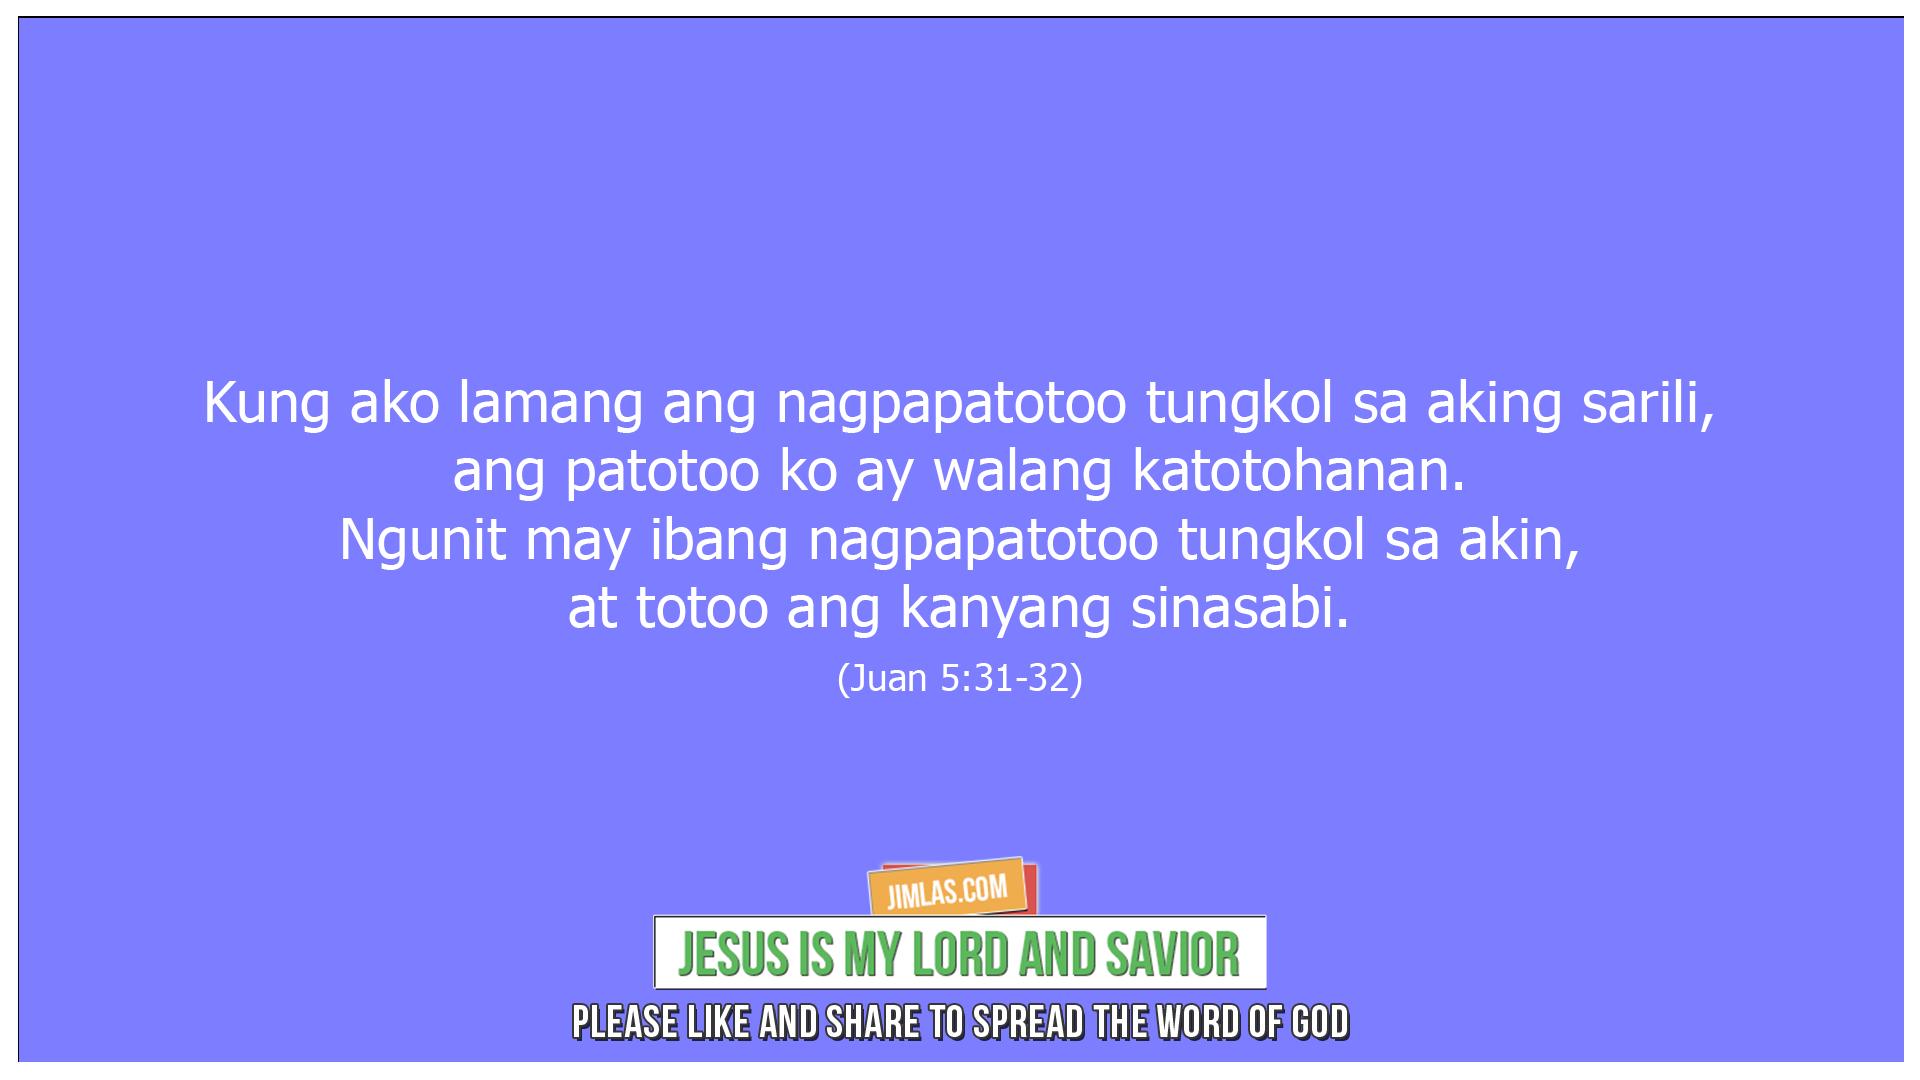 Juan 5 31-32, Juan 5:31-32